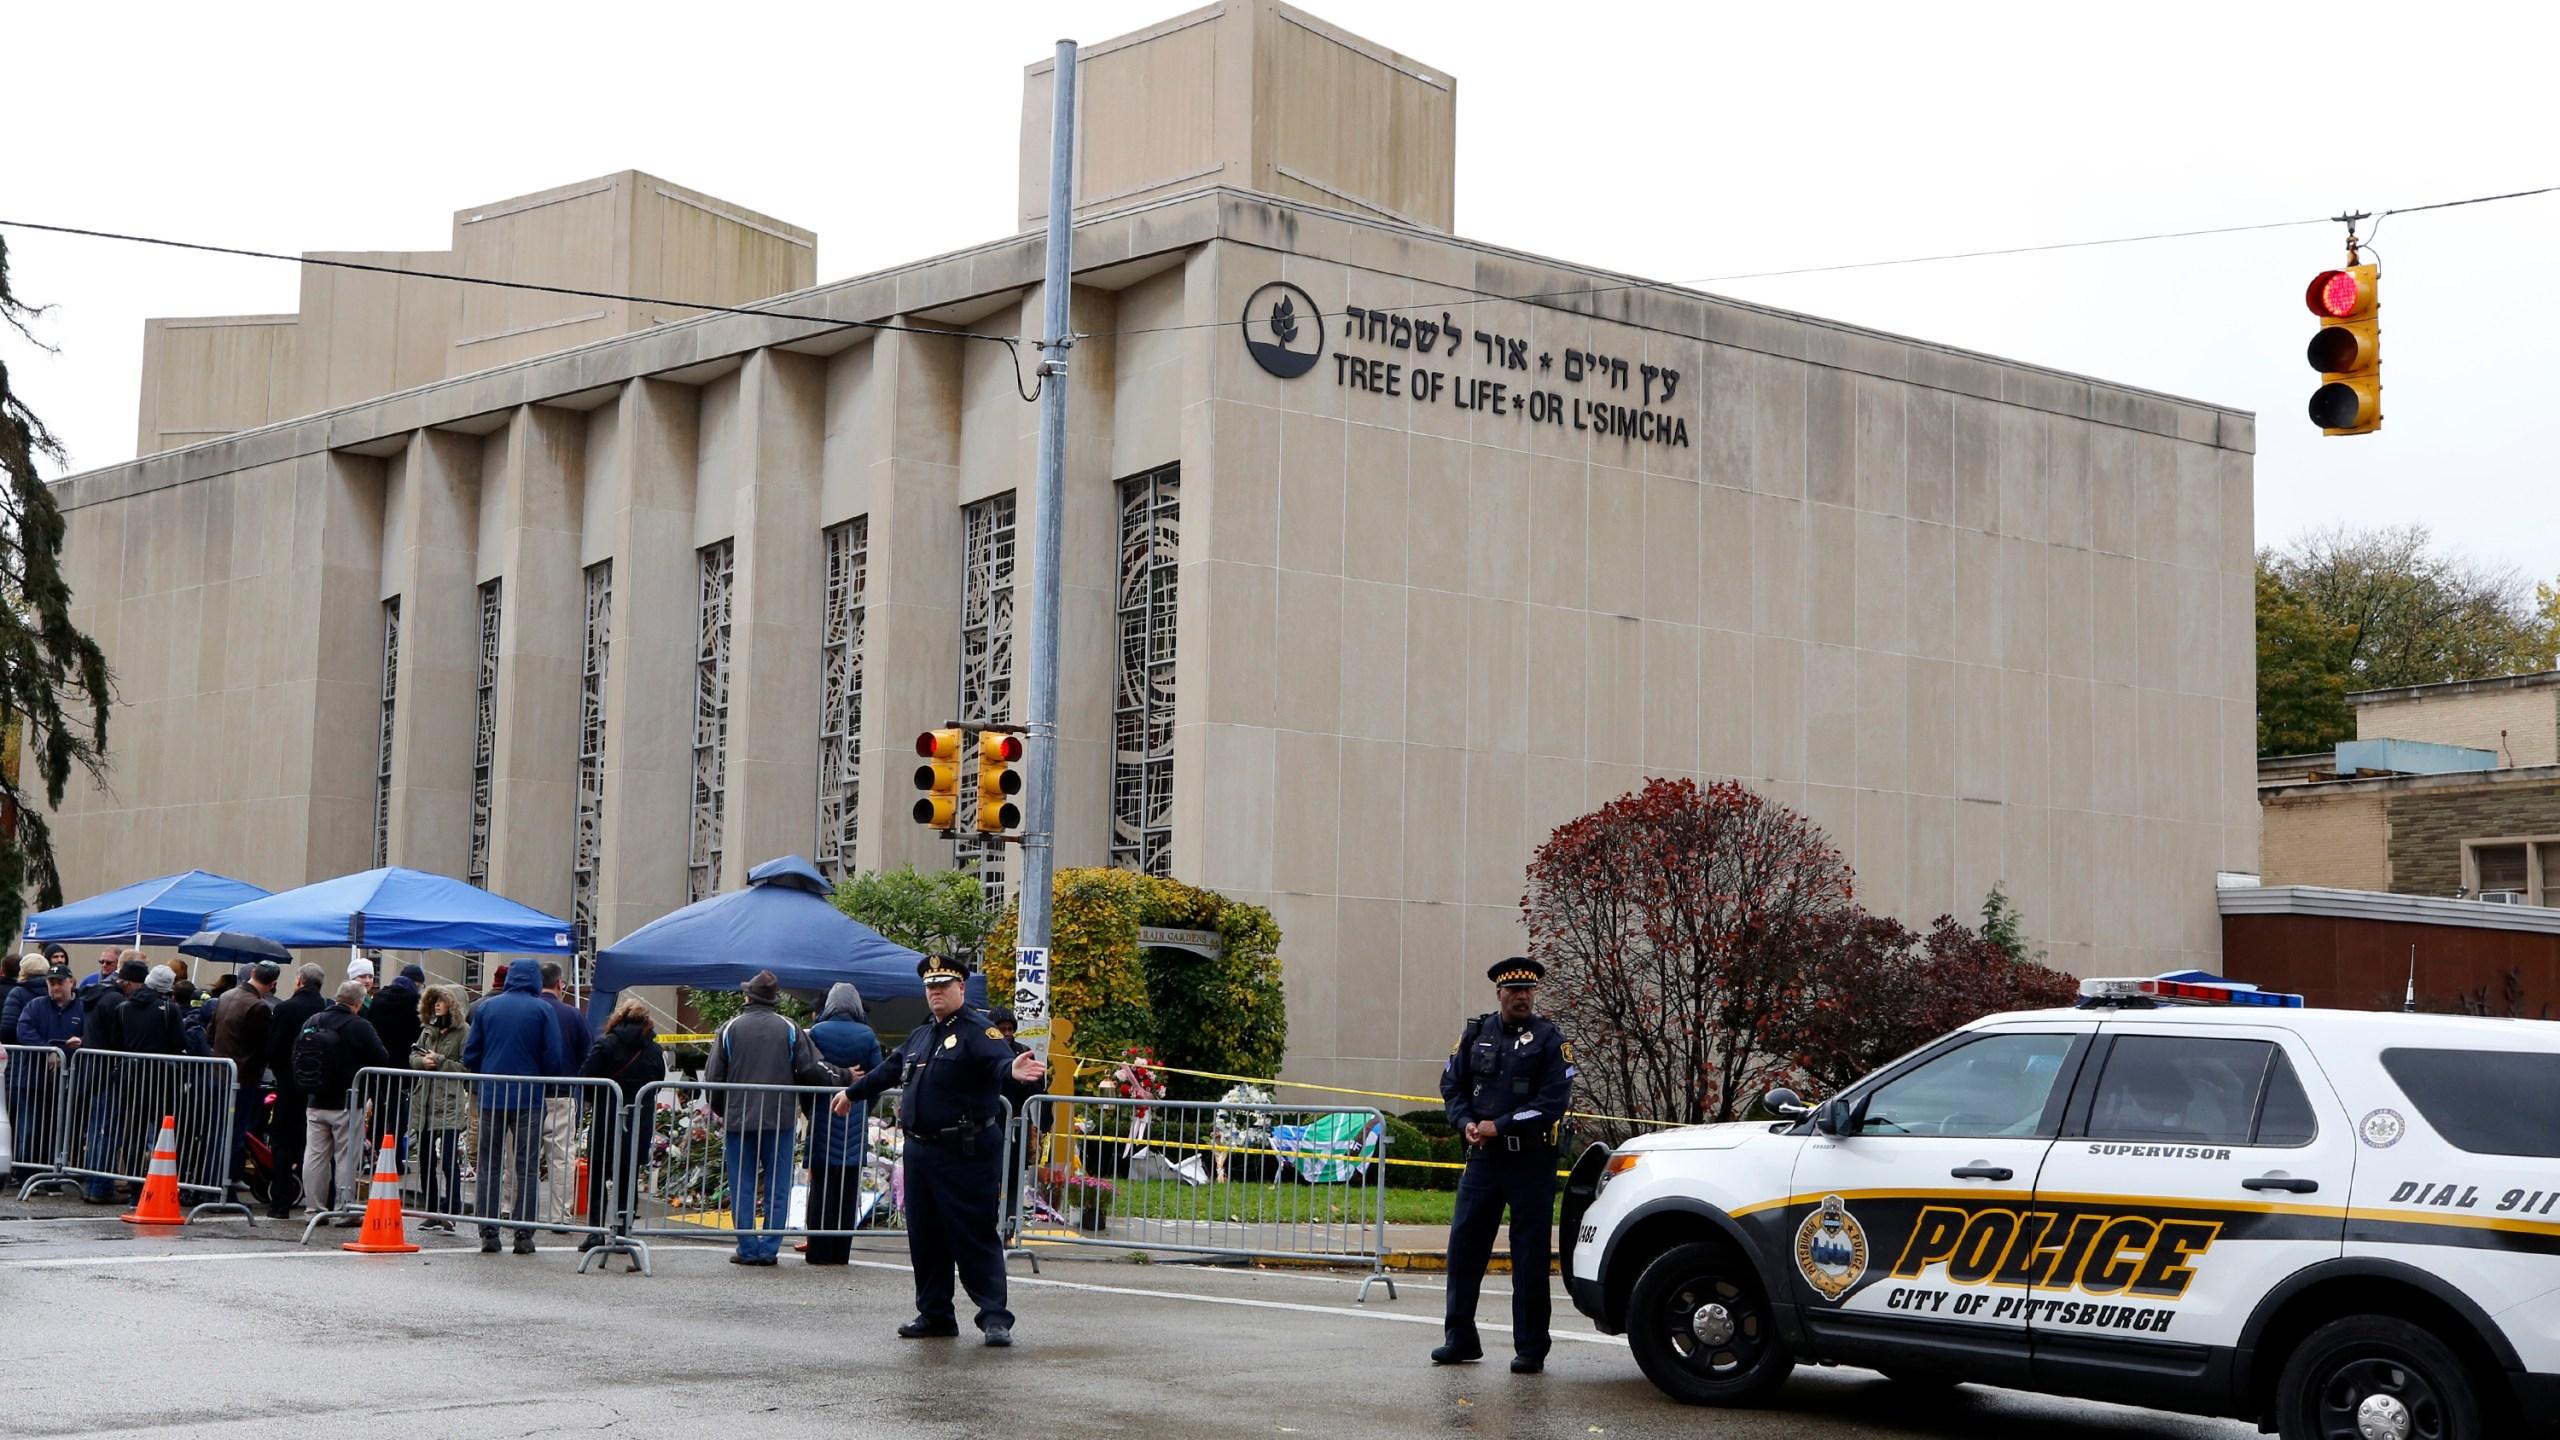 Shooting_Synagogue_22085-159532.jpg76151196